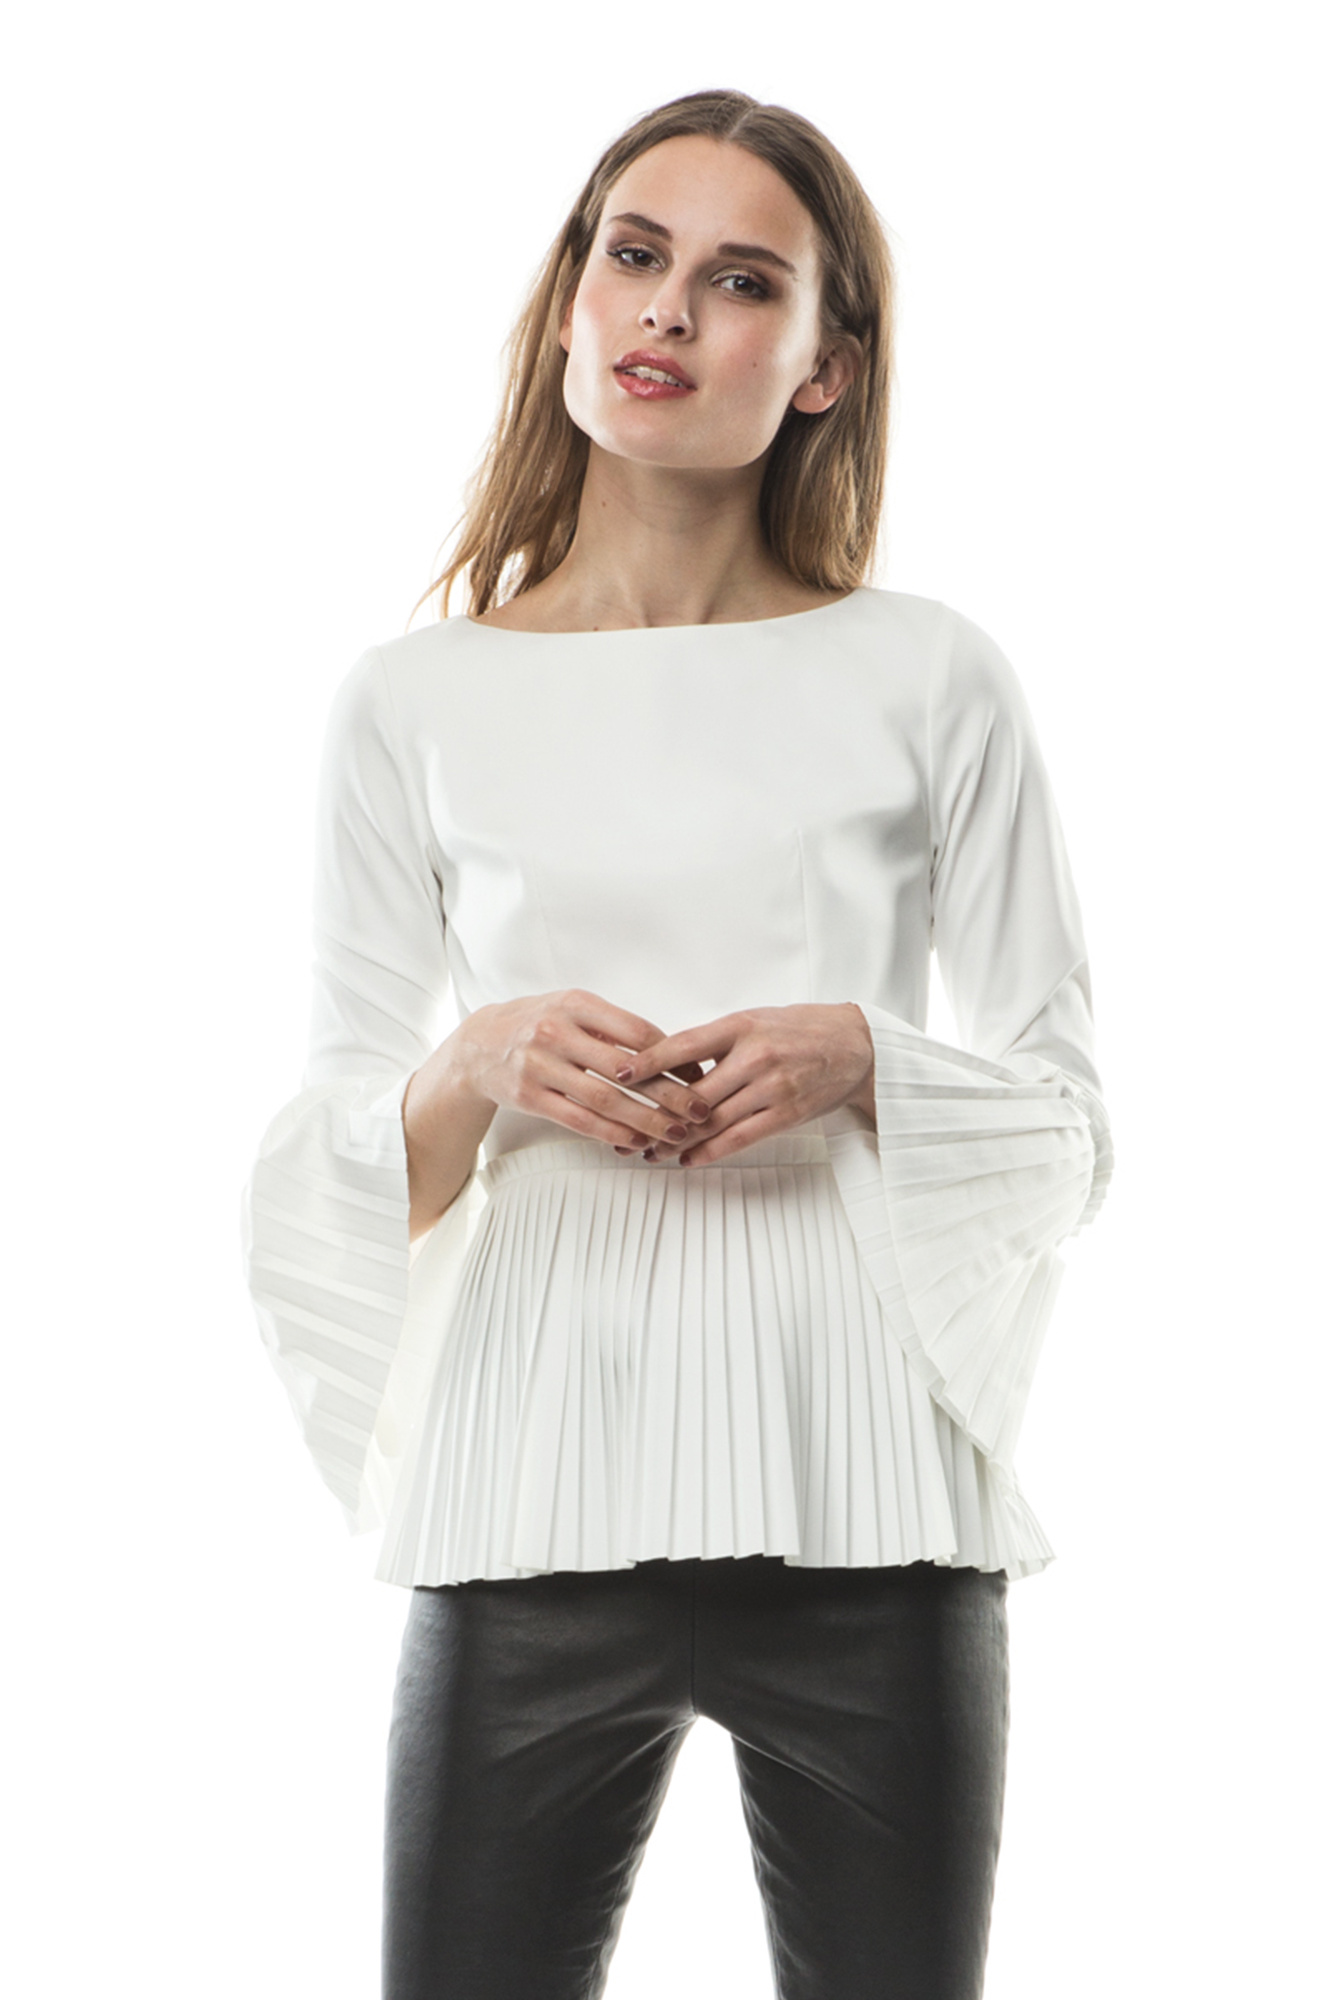 427_acf1fdddbc-blossom-blouse-white-1-1495sek-by-malina-big.jpg